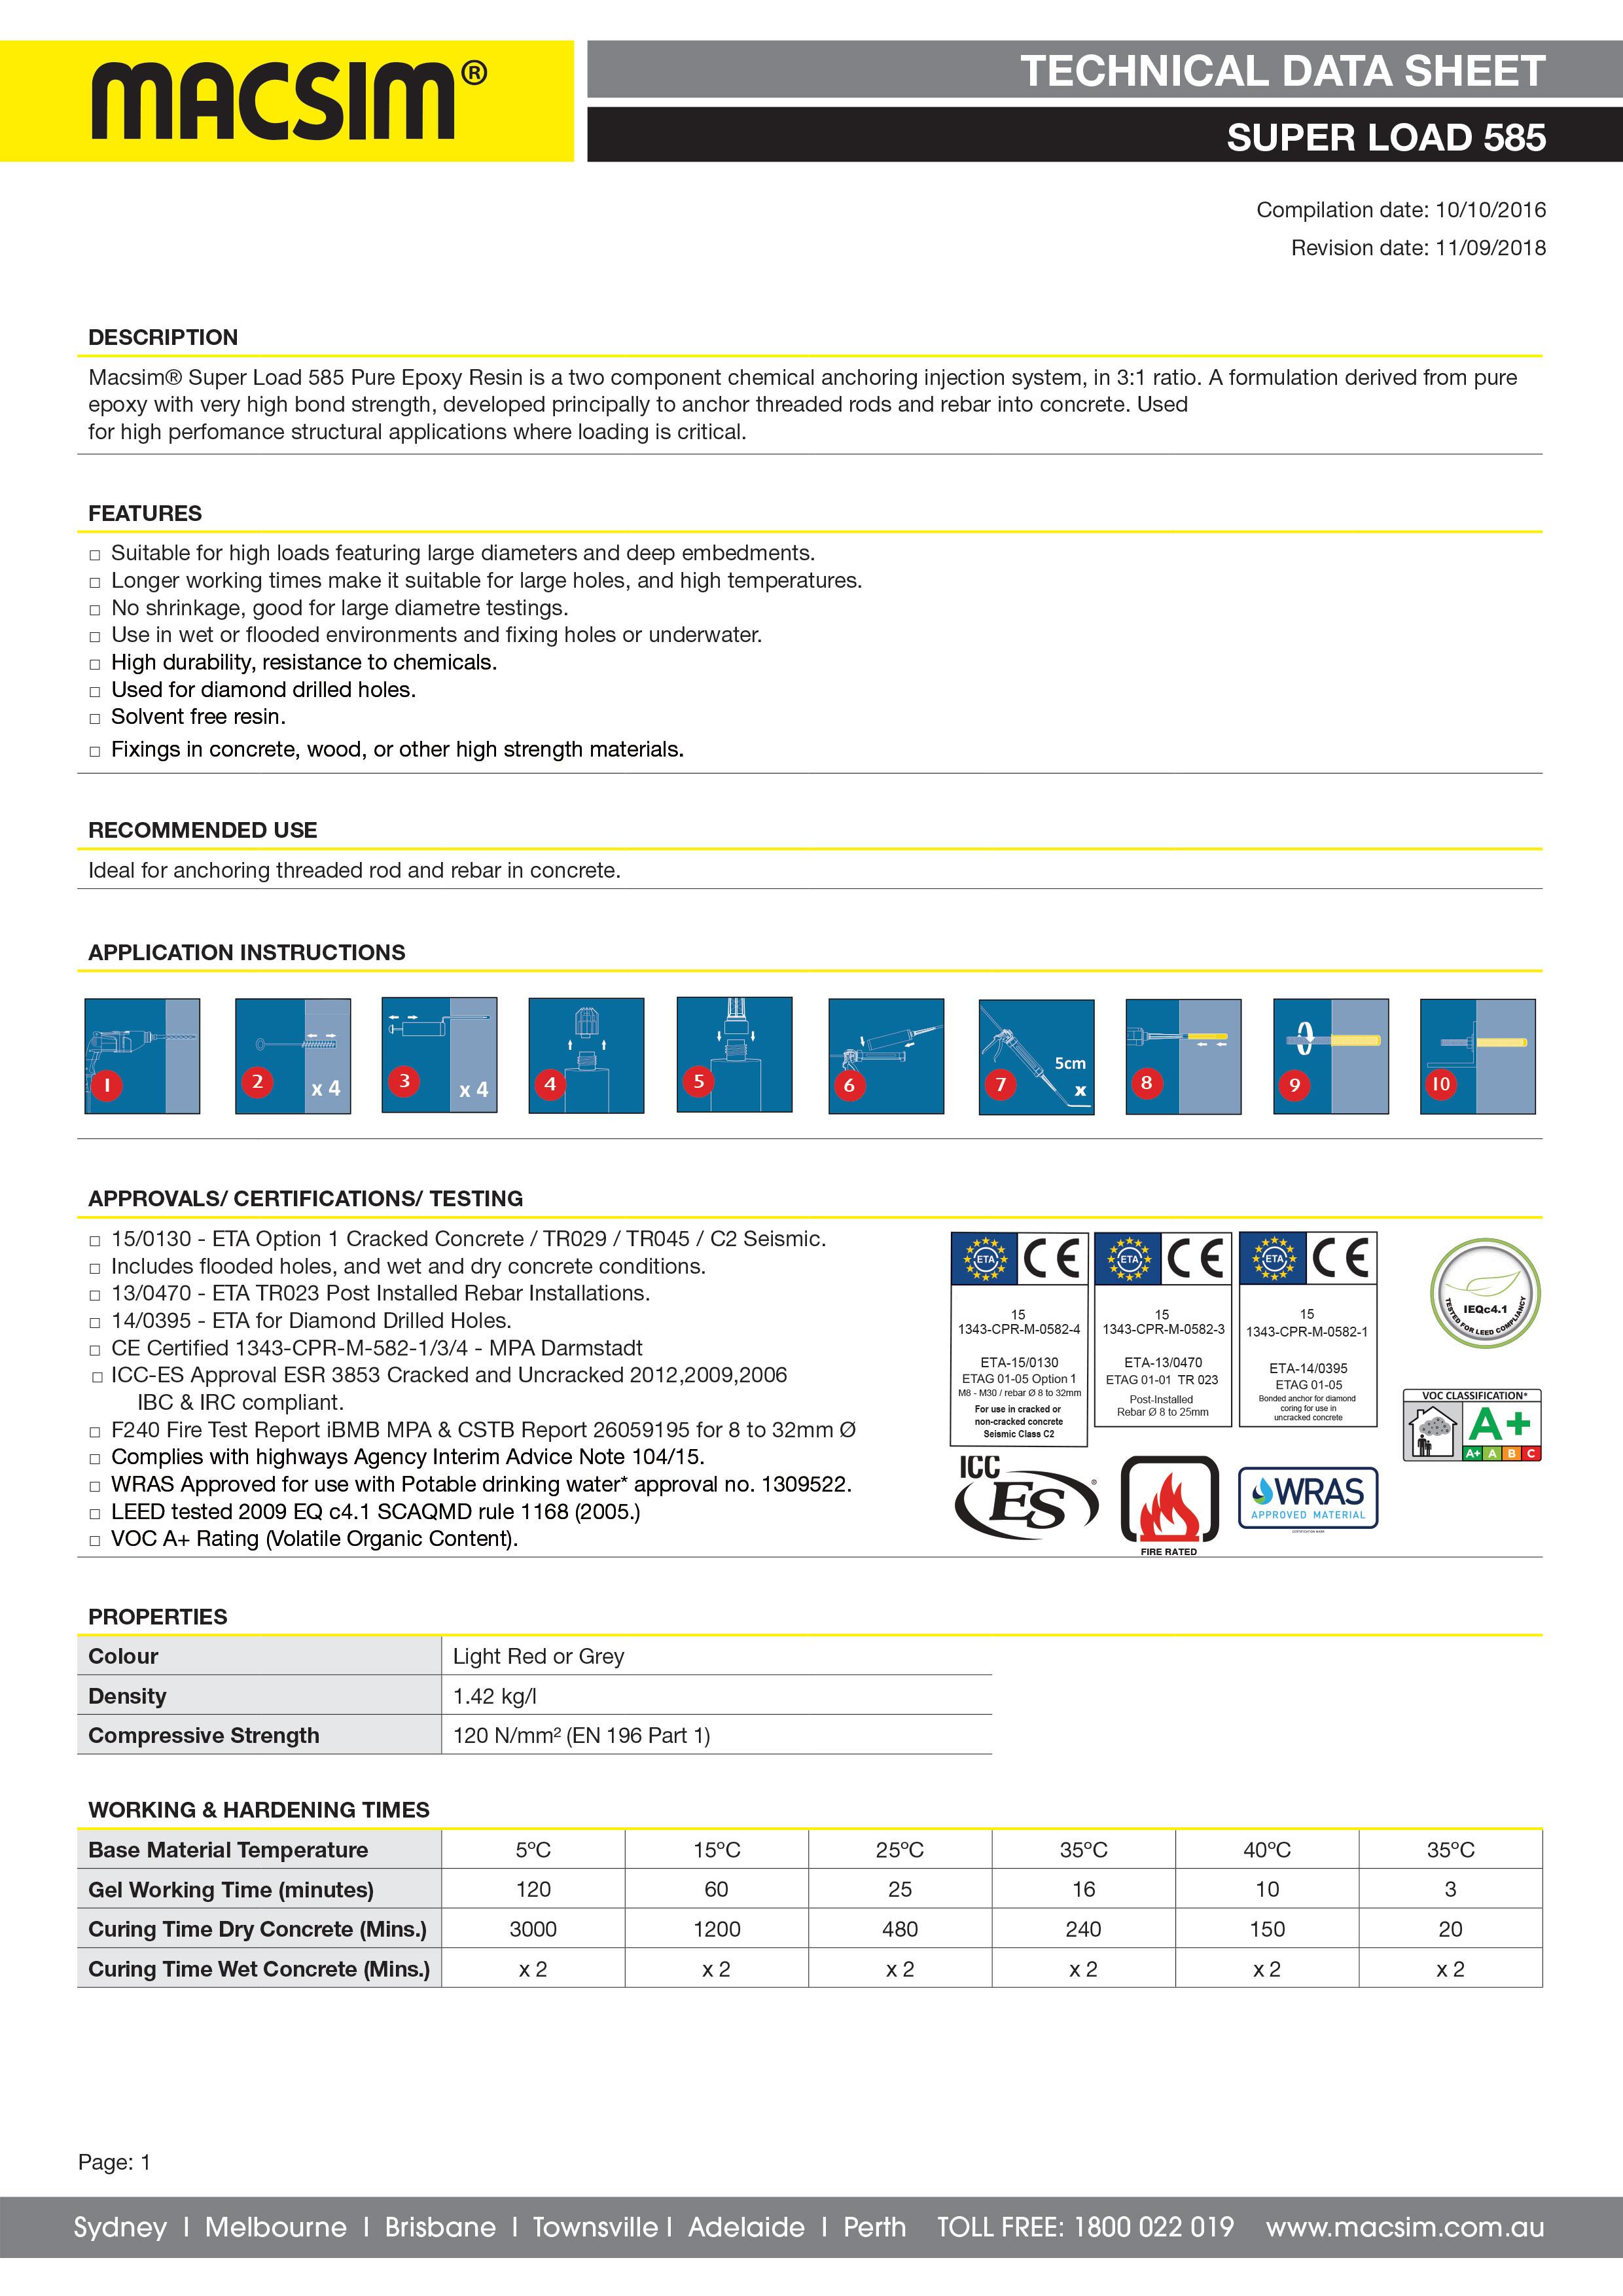 71SL Superload Technical Data Sheet